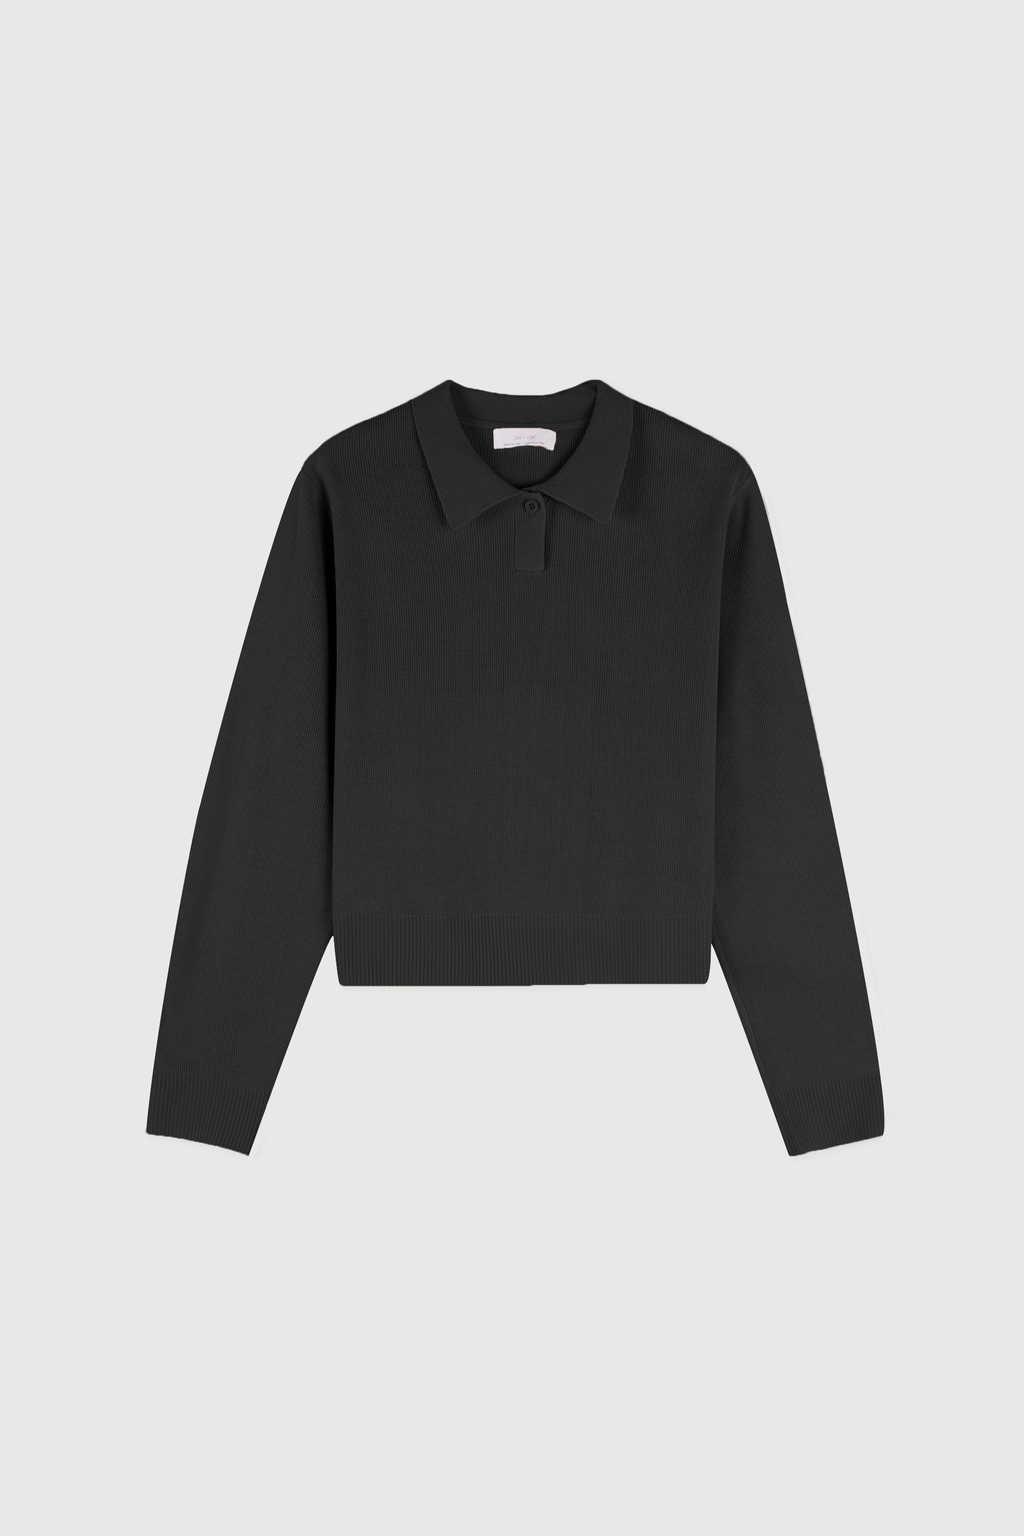 Sweater 3036 Black 7